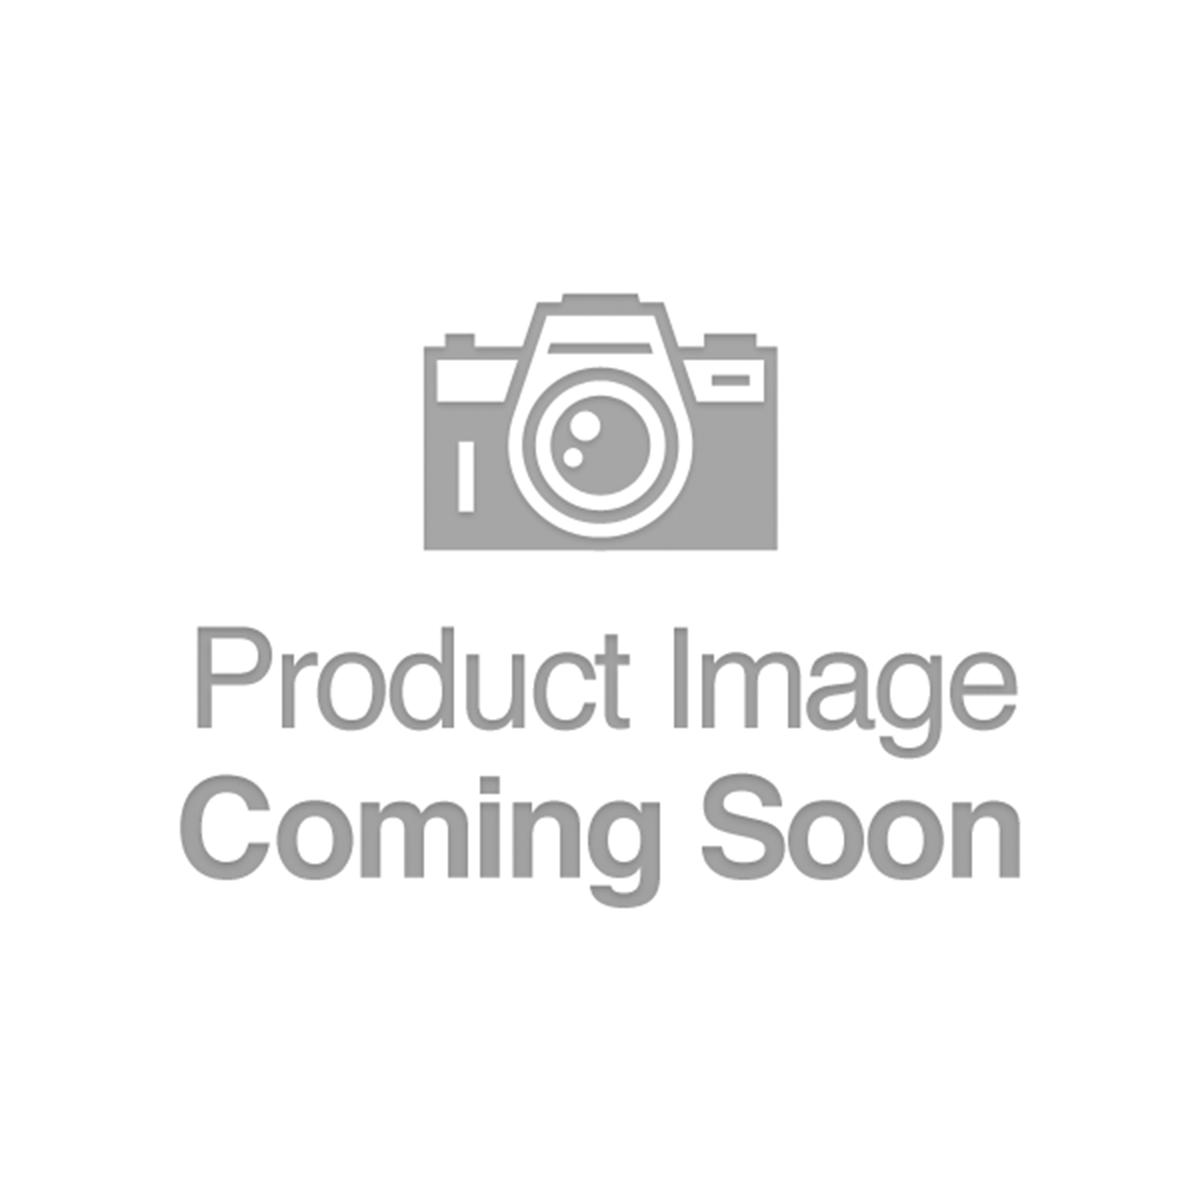 Fredericksburg - Virginia - CH 1582 - FR 599 - PMG 35